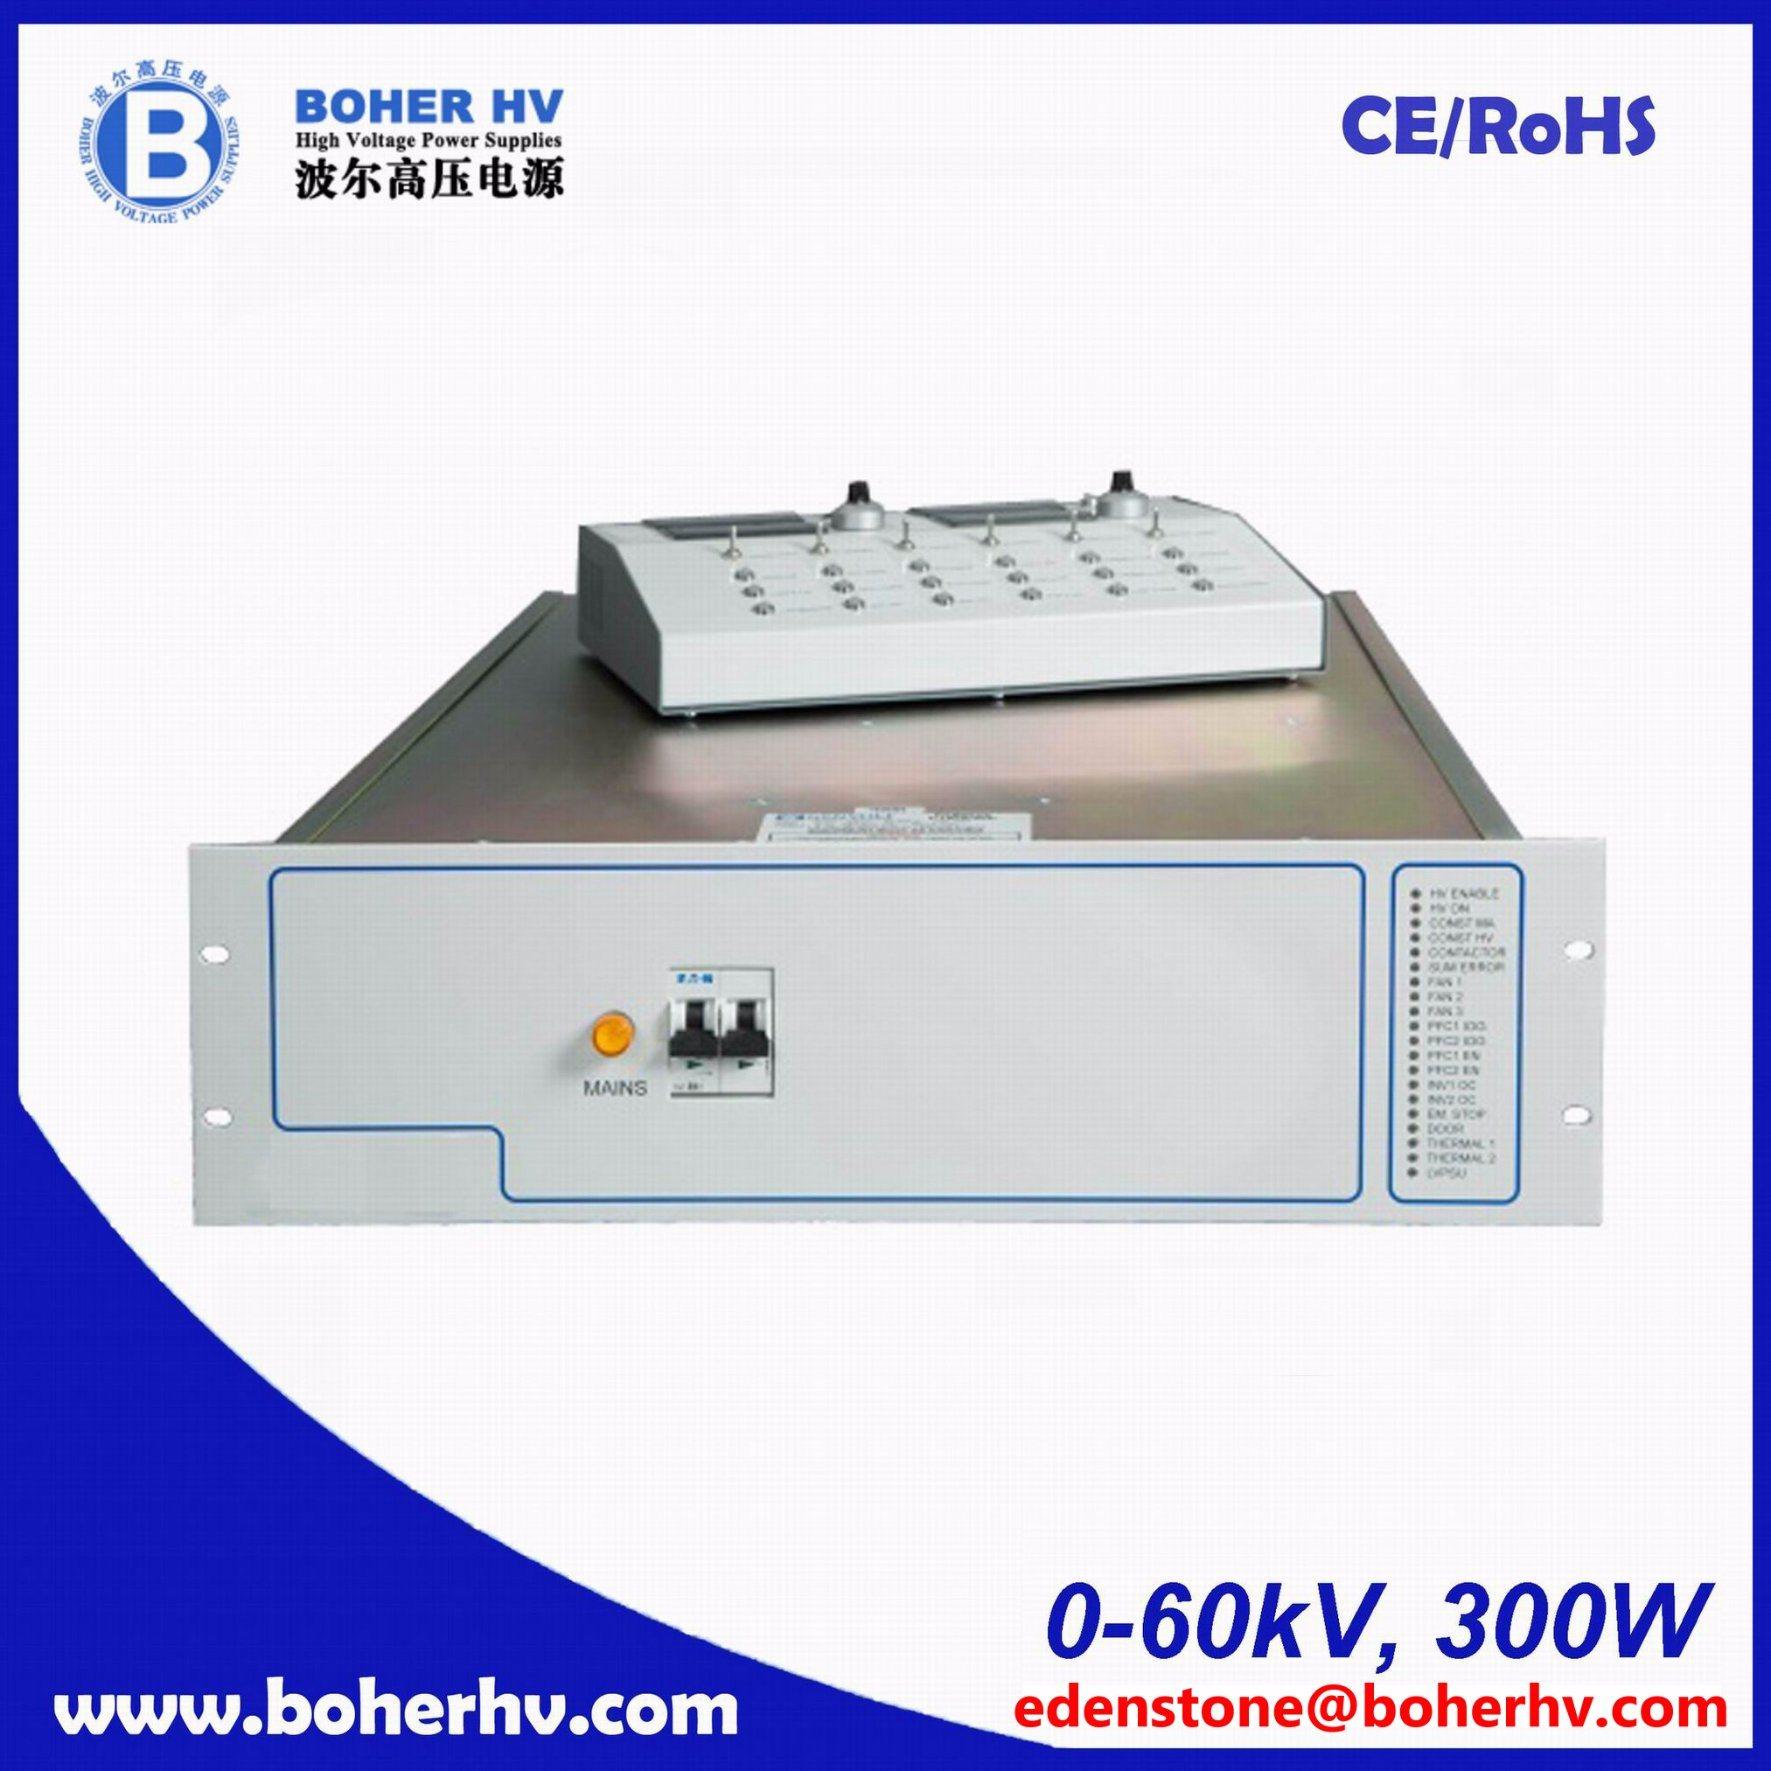 High Voltage Rack power supply for general purpose LAS-230VAC-P300-60K-2U